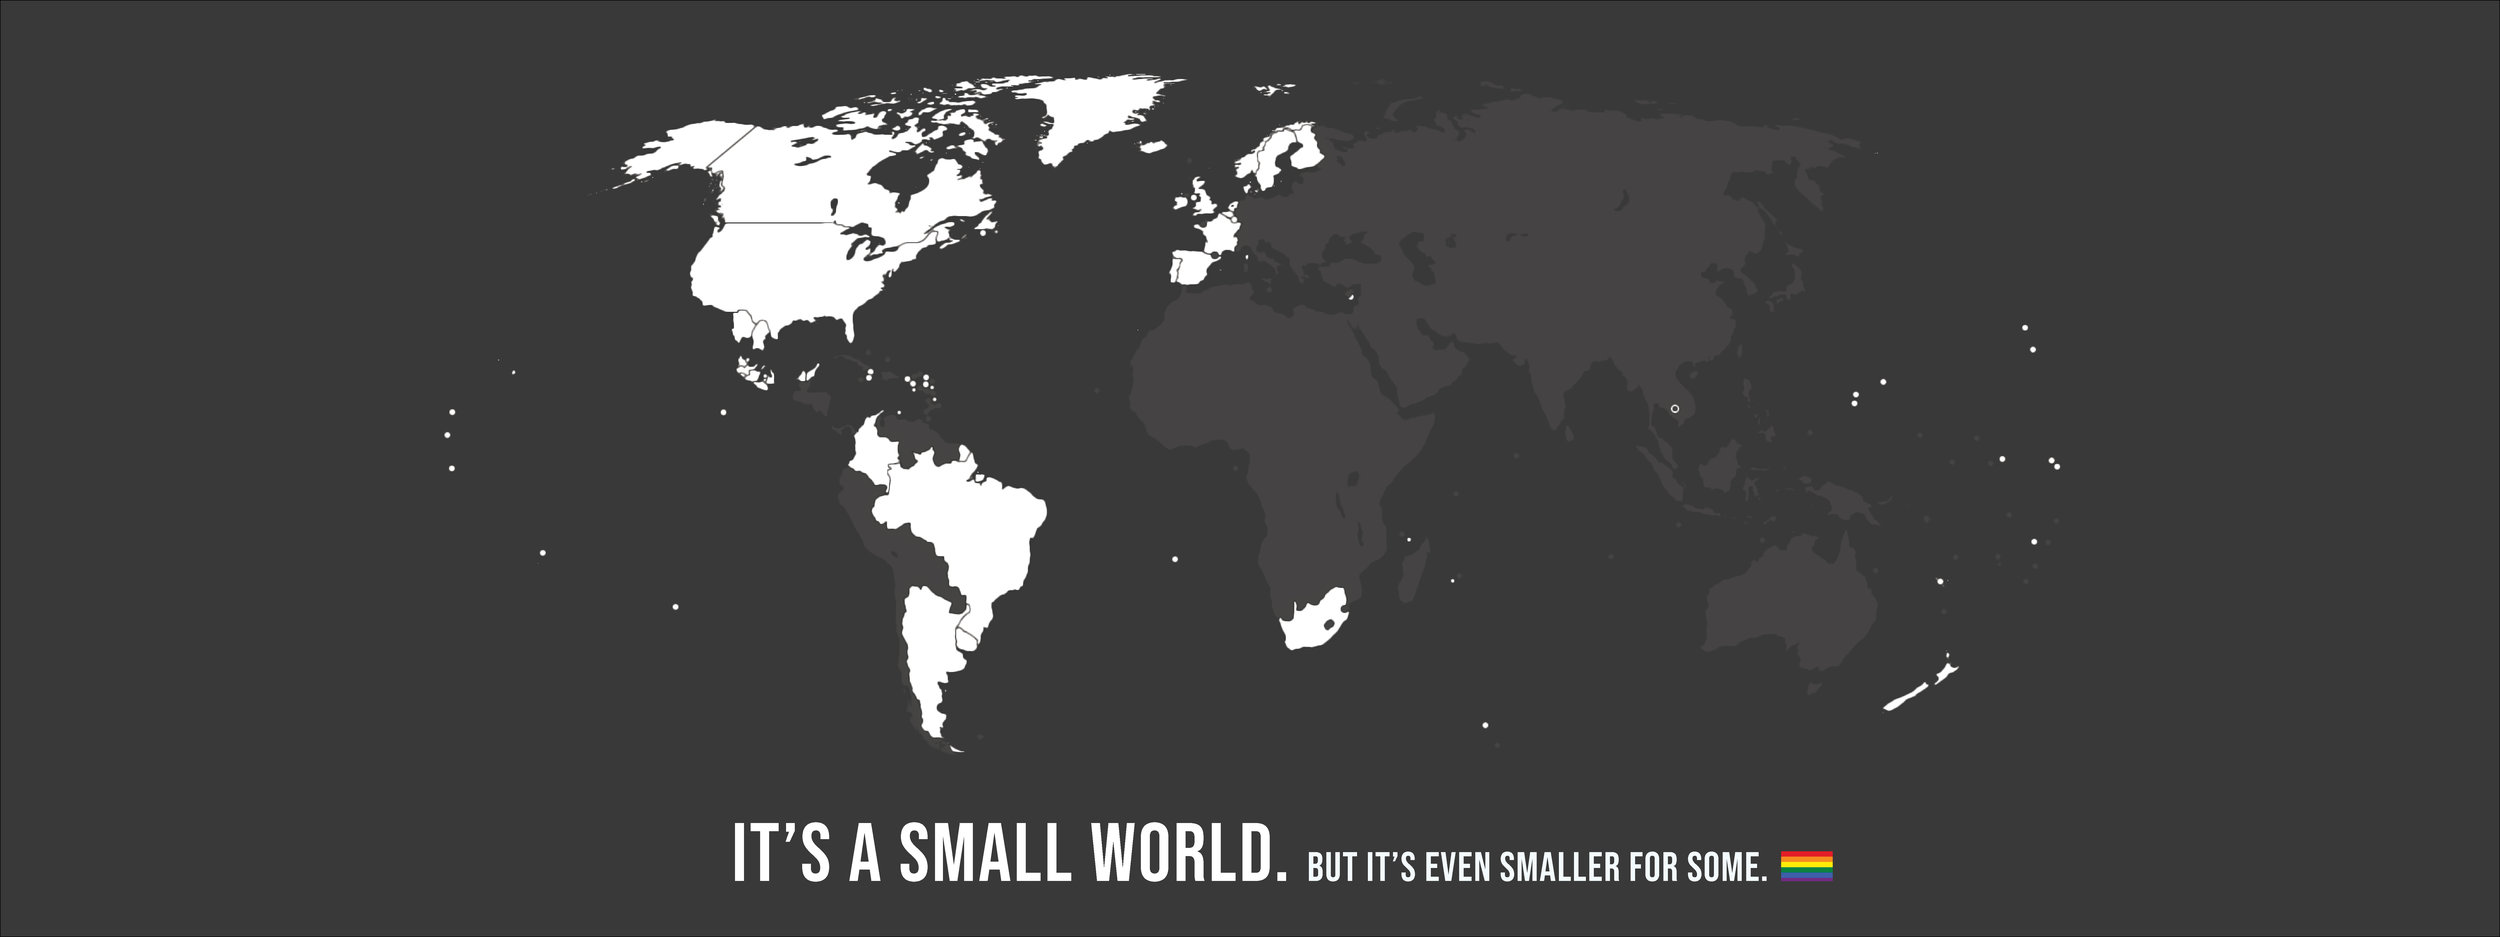 Small World 2019 - Mr. Smithee.jpg